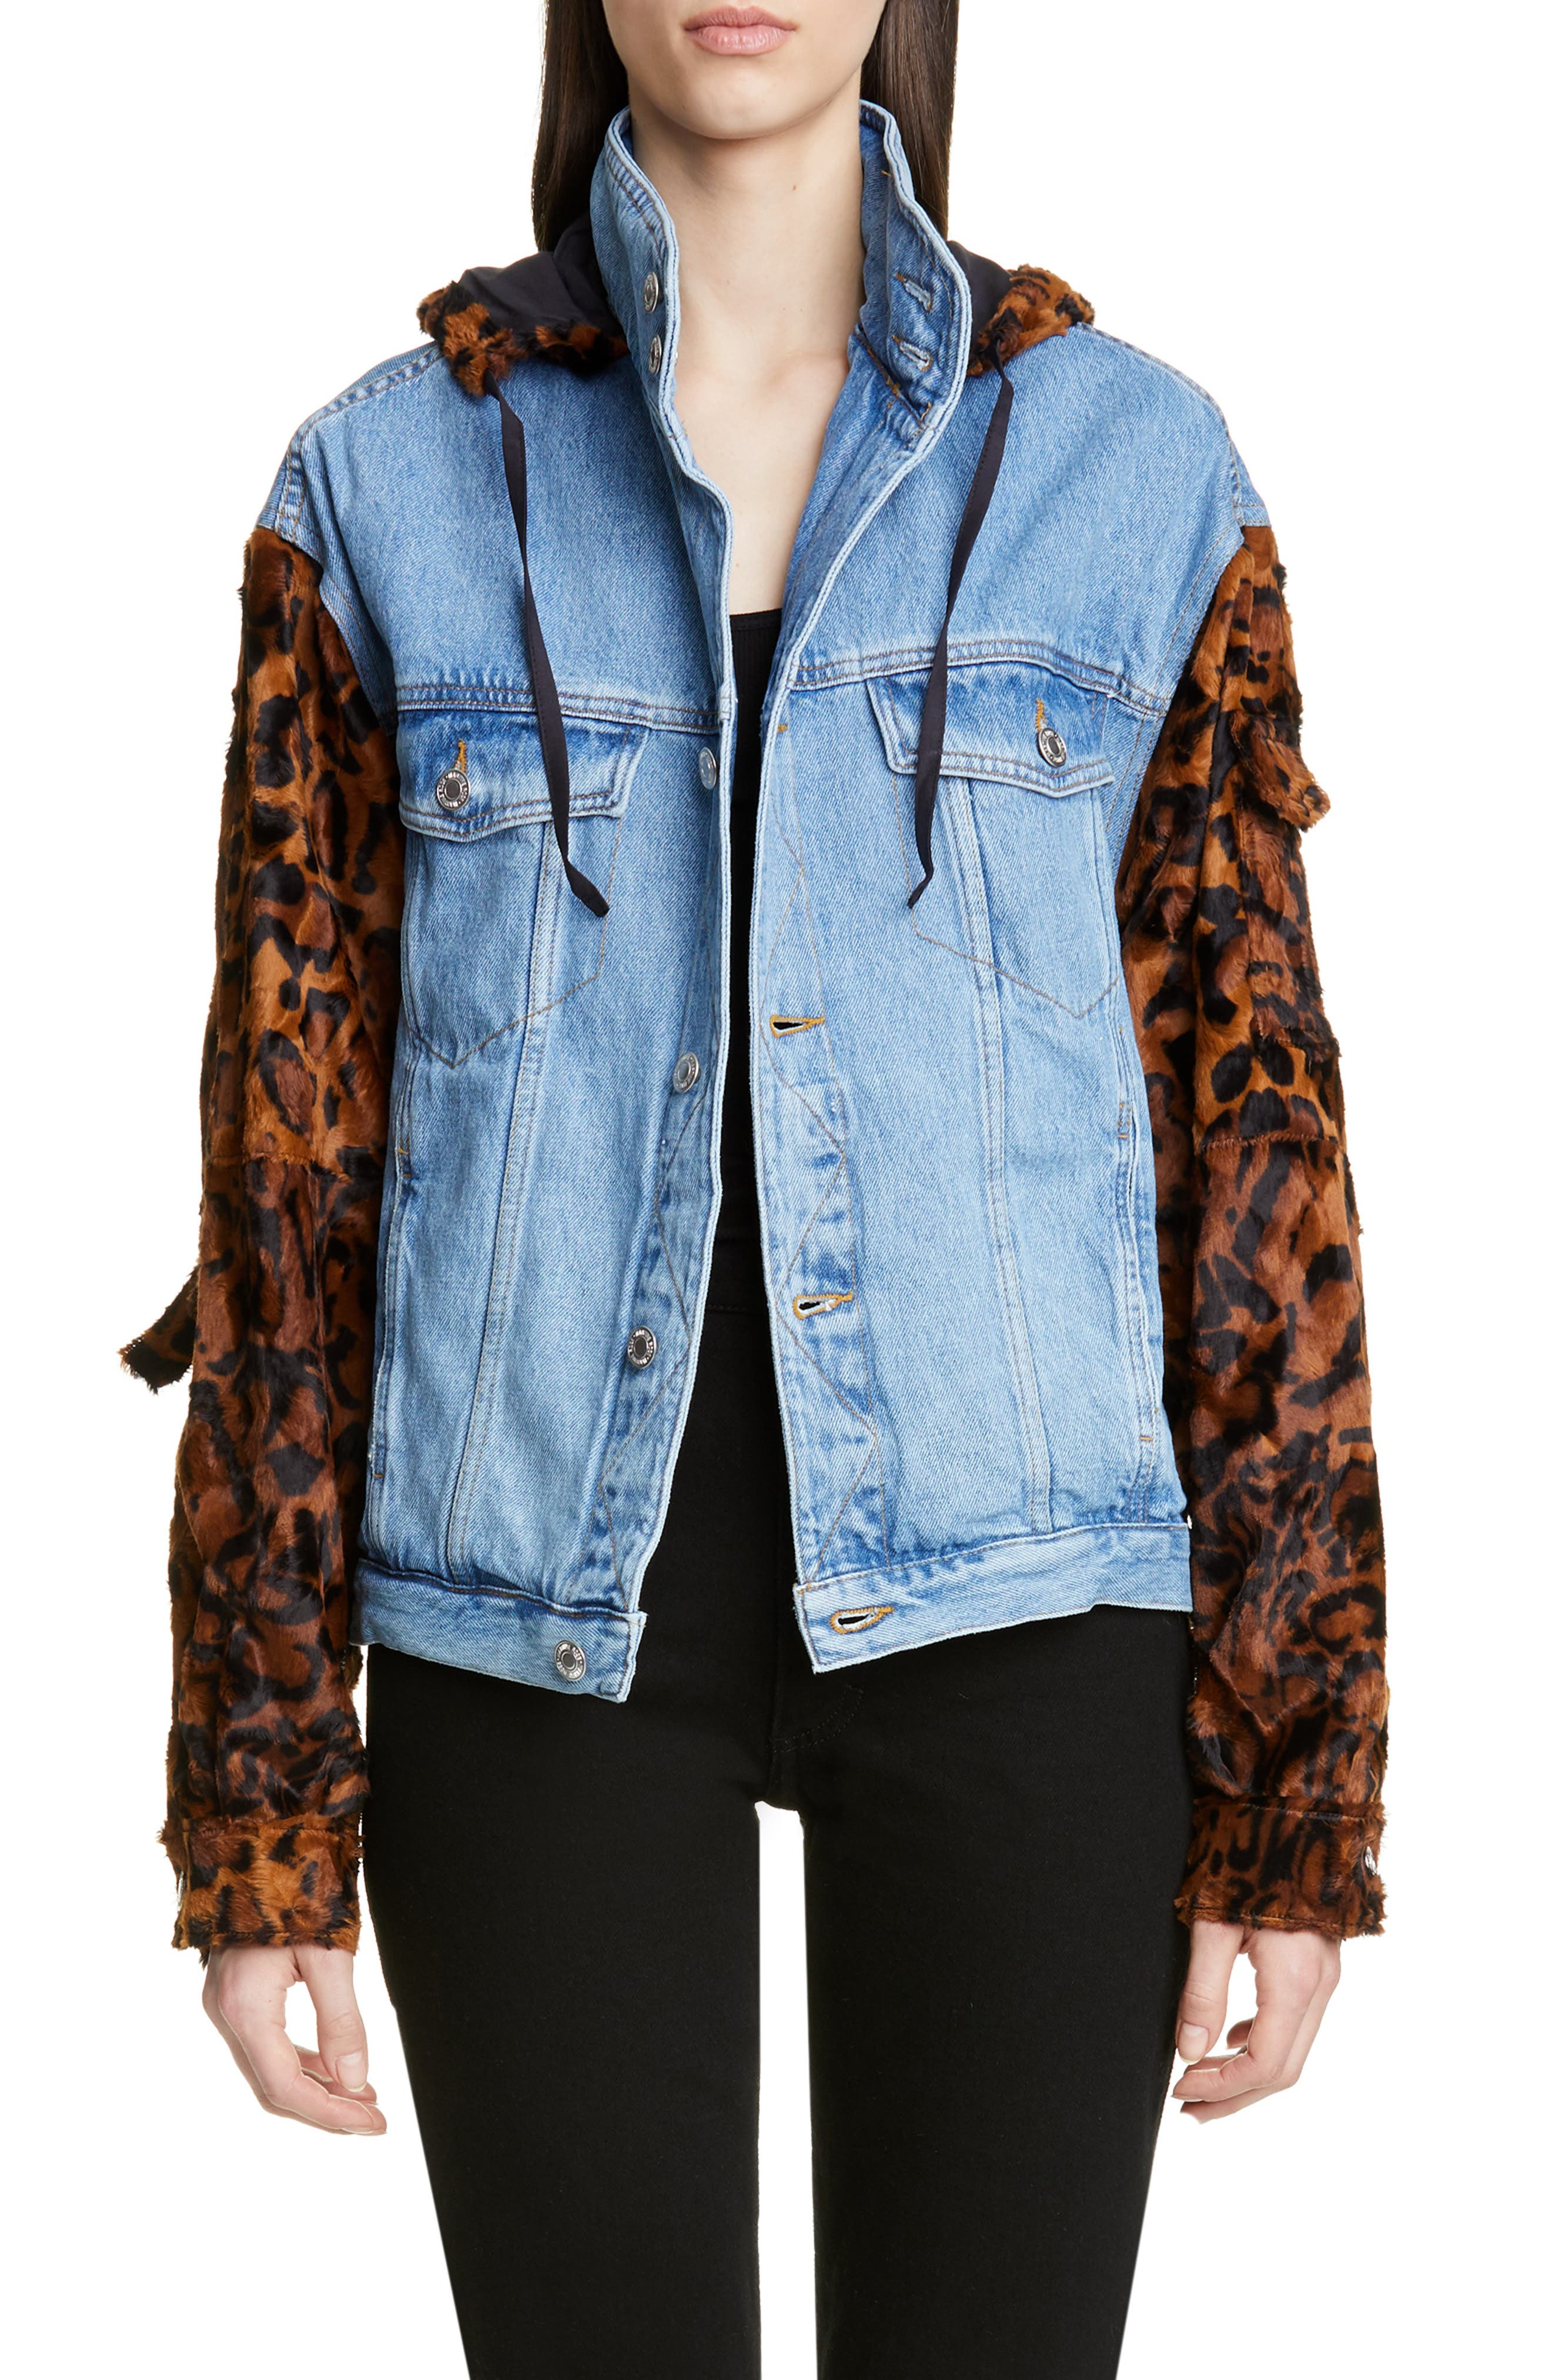 MARTINE ROSE, Leopard Hooded Denim Jacket, Main thumbnail 1, color, LIGHT DENIM DARK